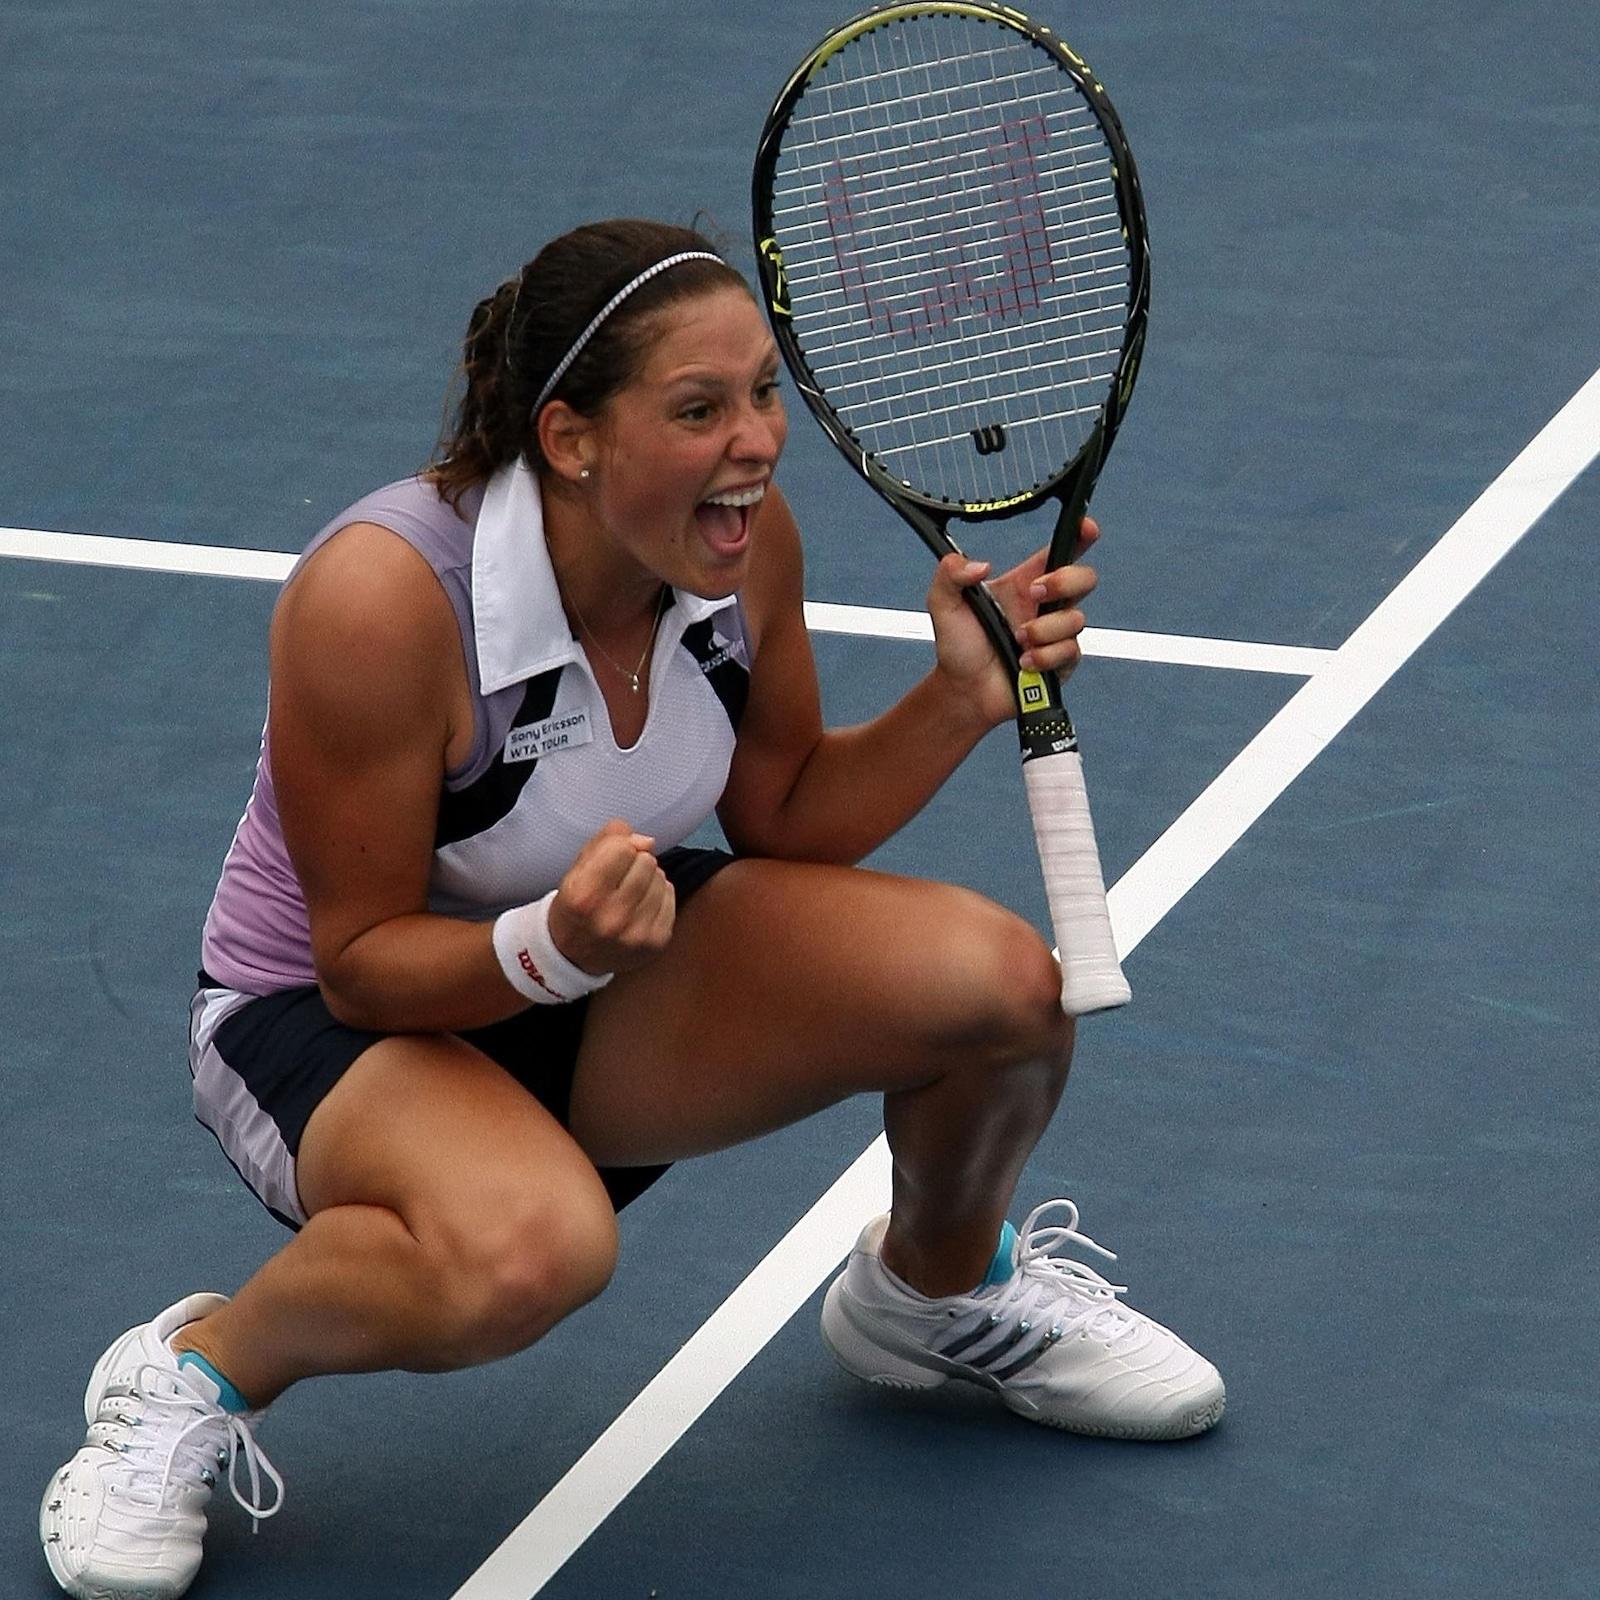 Stéphanie Dubois à Wimbledon en 2001